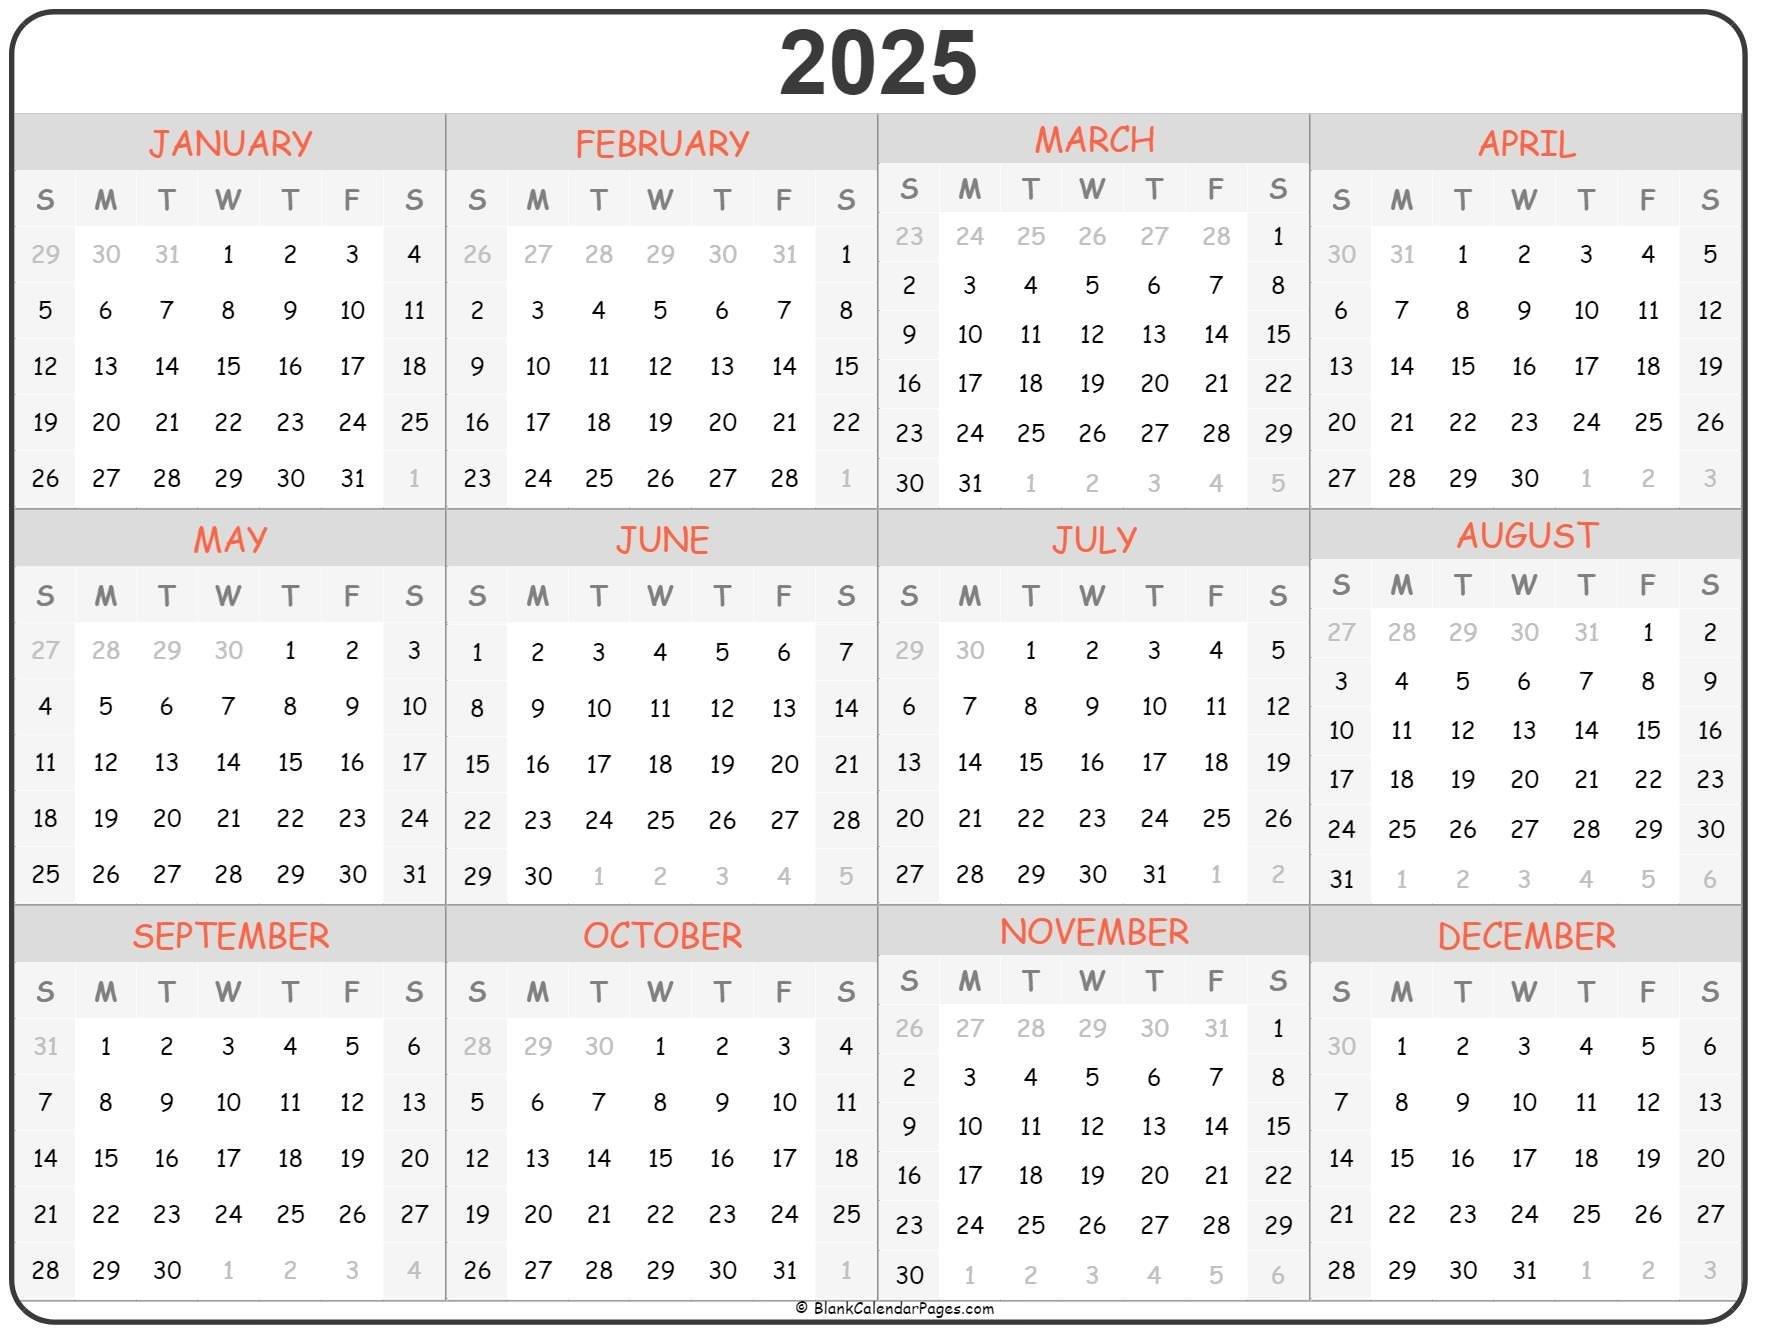 2025 Year Calendar | Yearly Printable regarding Calender 2021 To 2025